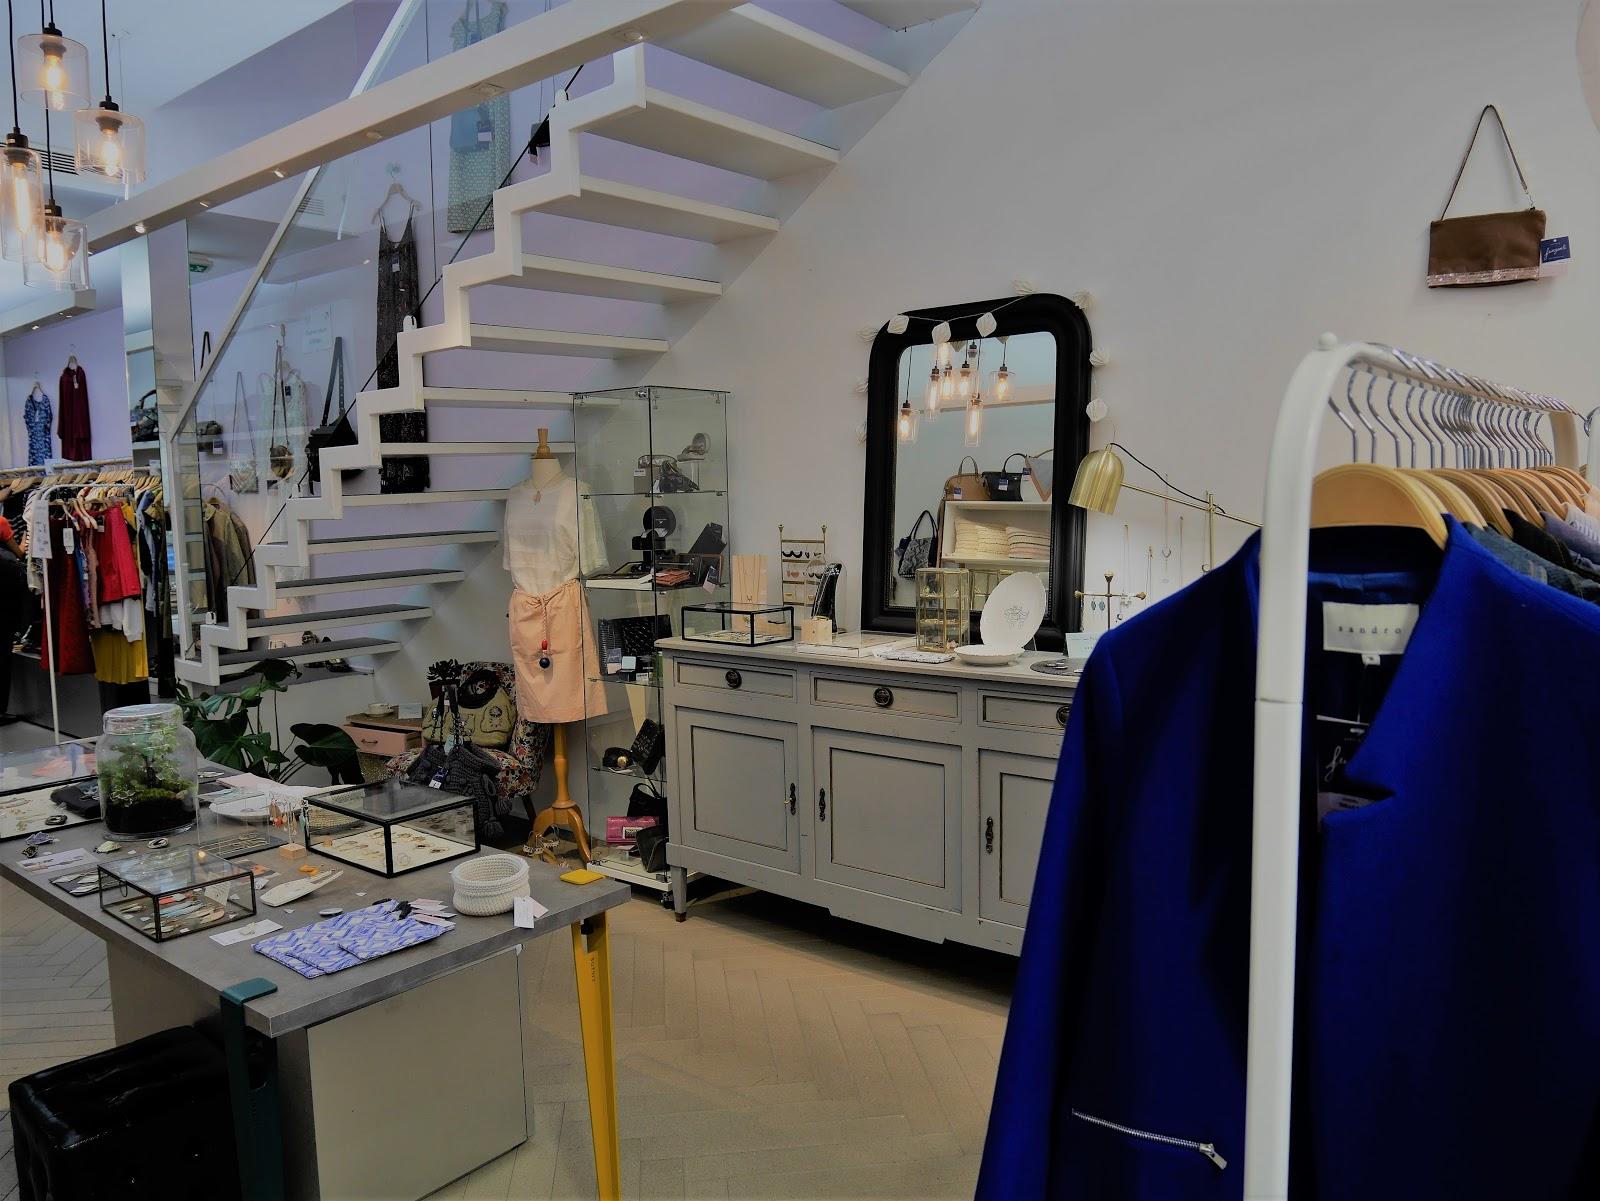 fringante-boutique-depot-vente-et-createurs-nogent-sur-marne-danslaruedacote.fr